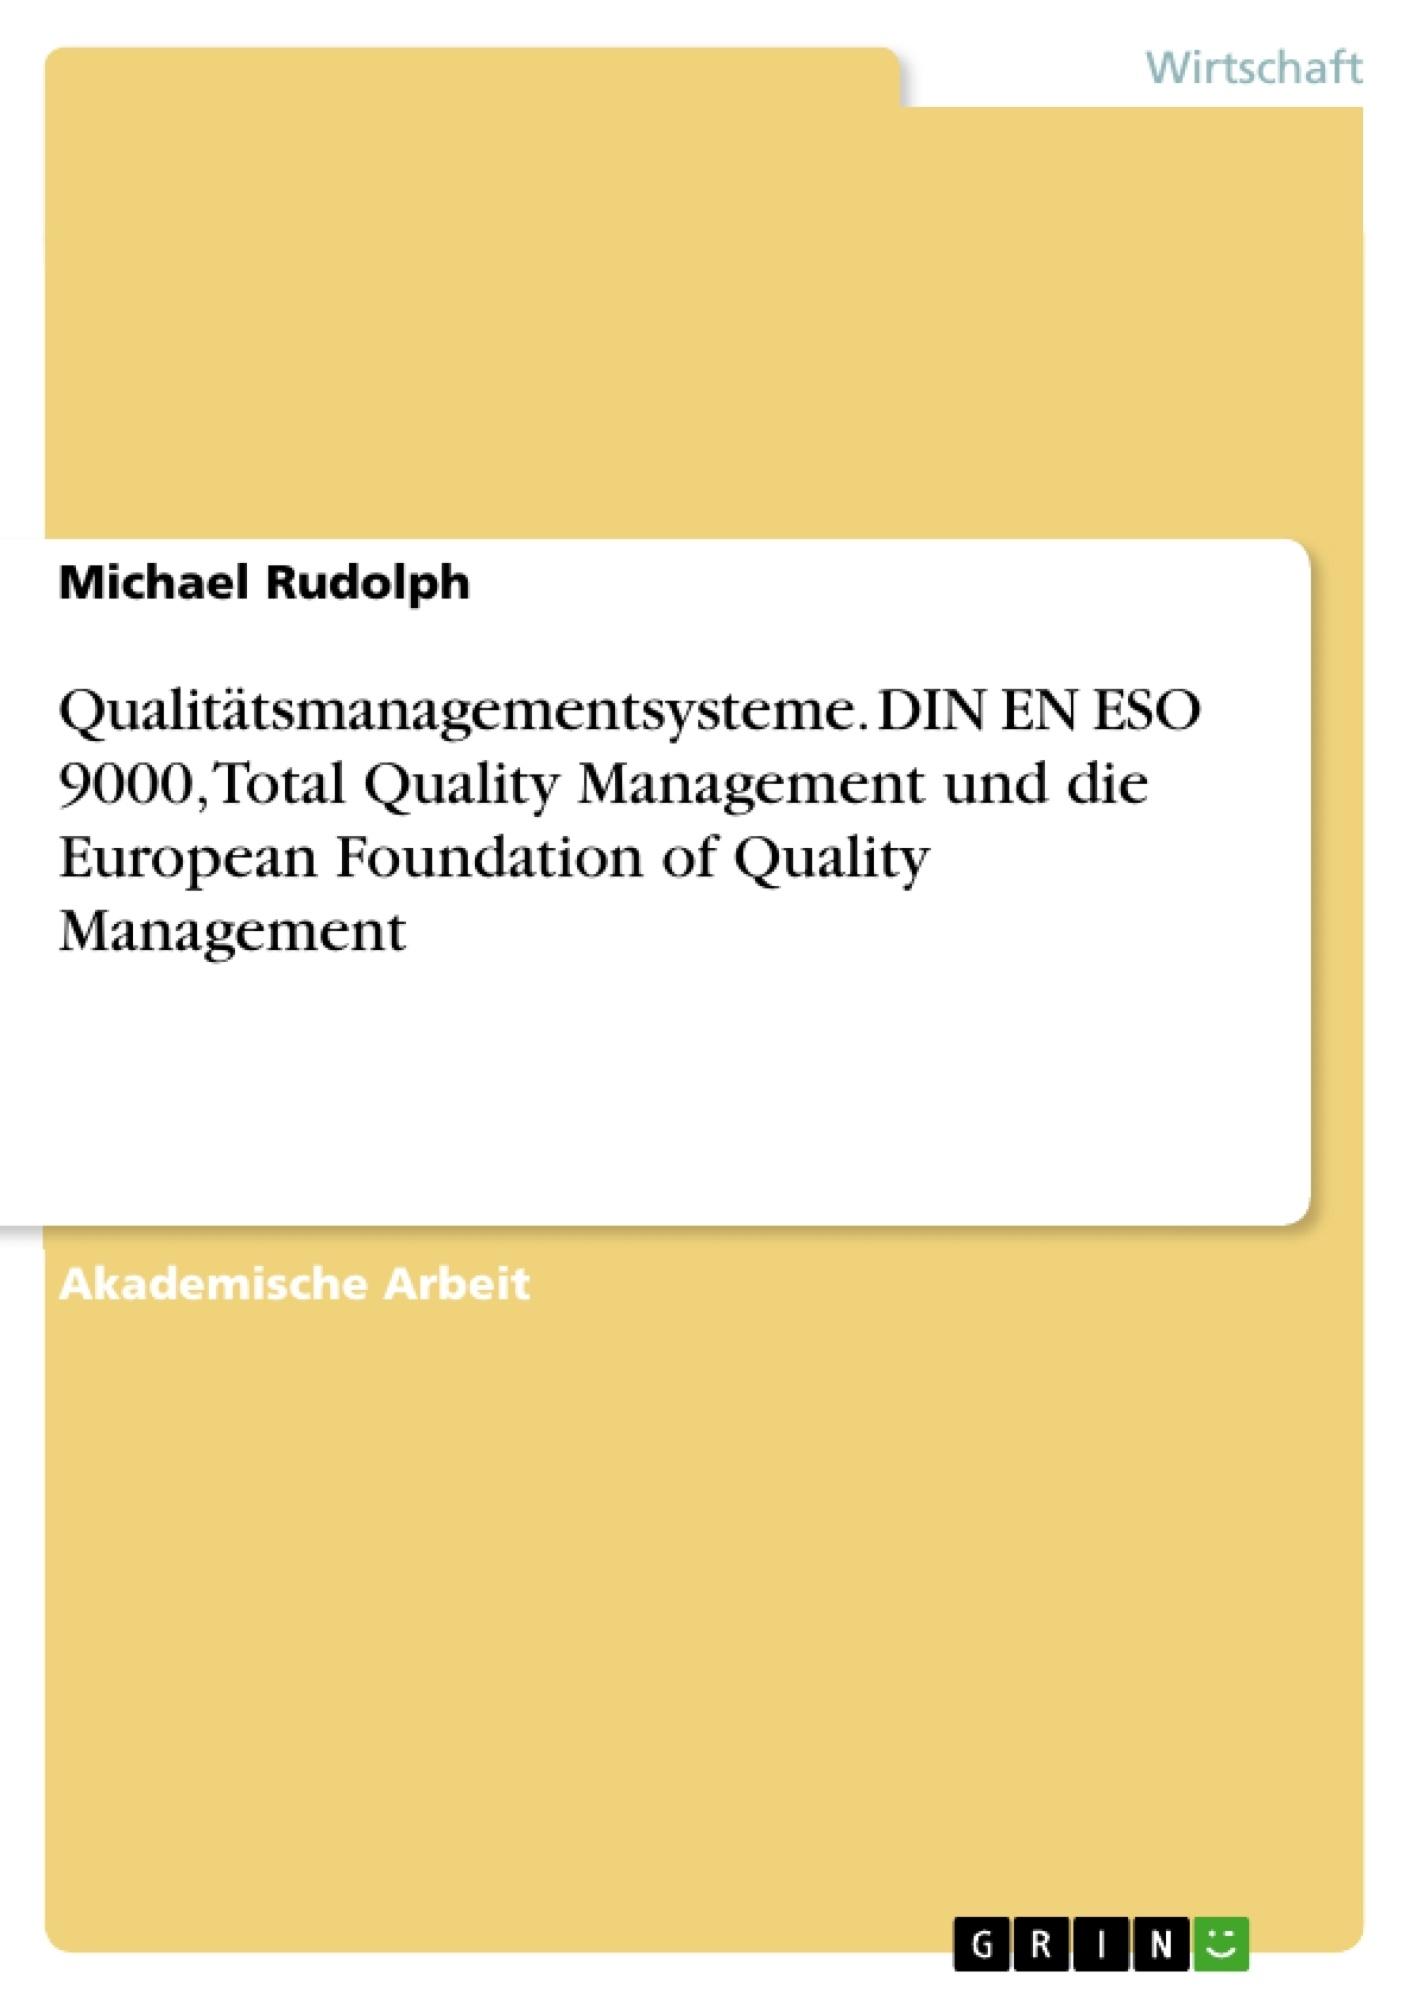 Titel: Qualitätsmanagementsysteme. DIN EN ESO 9000, Total Quality Management und die European Foundation of Quality Management